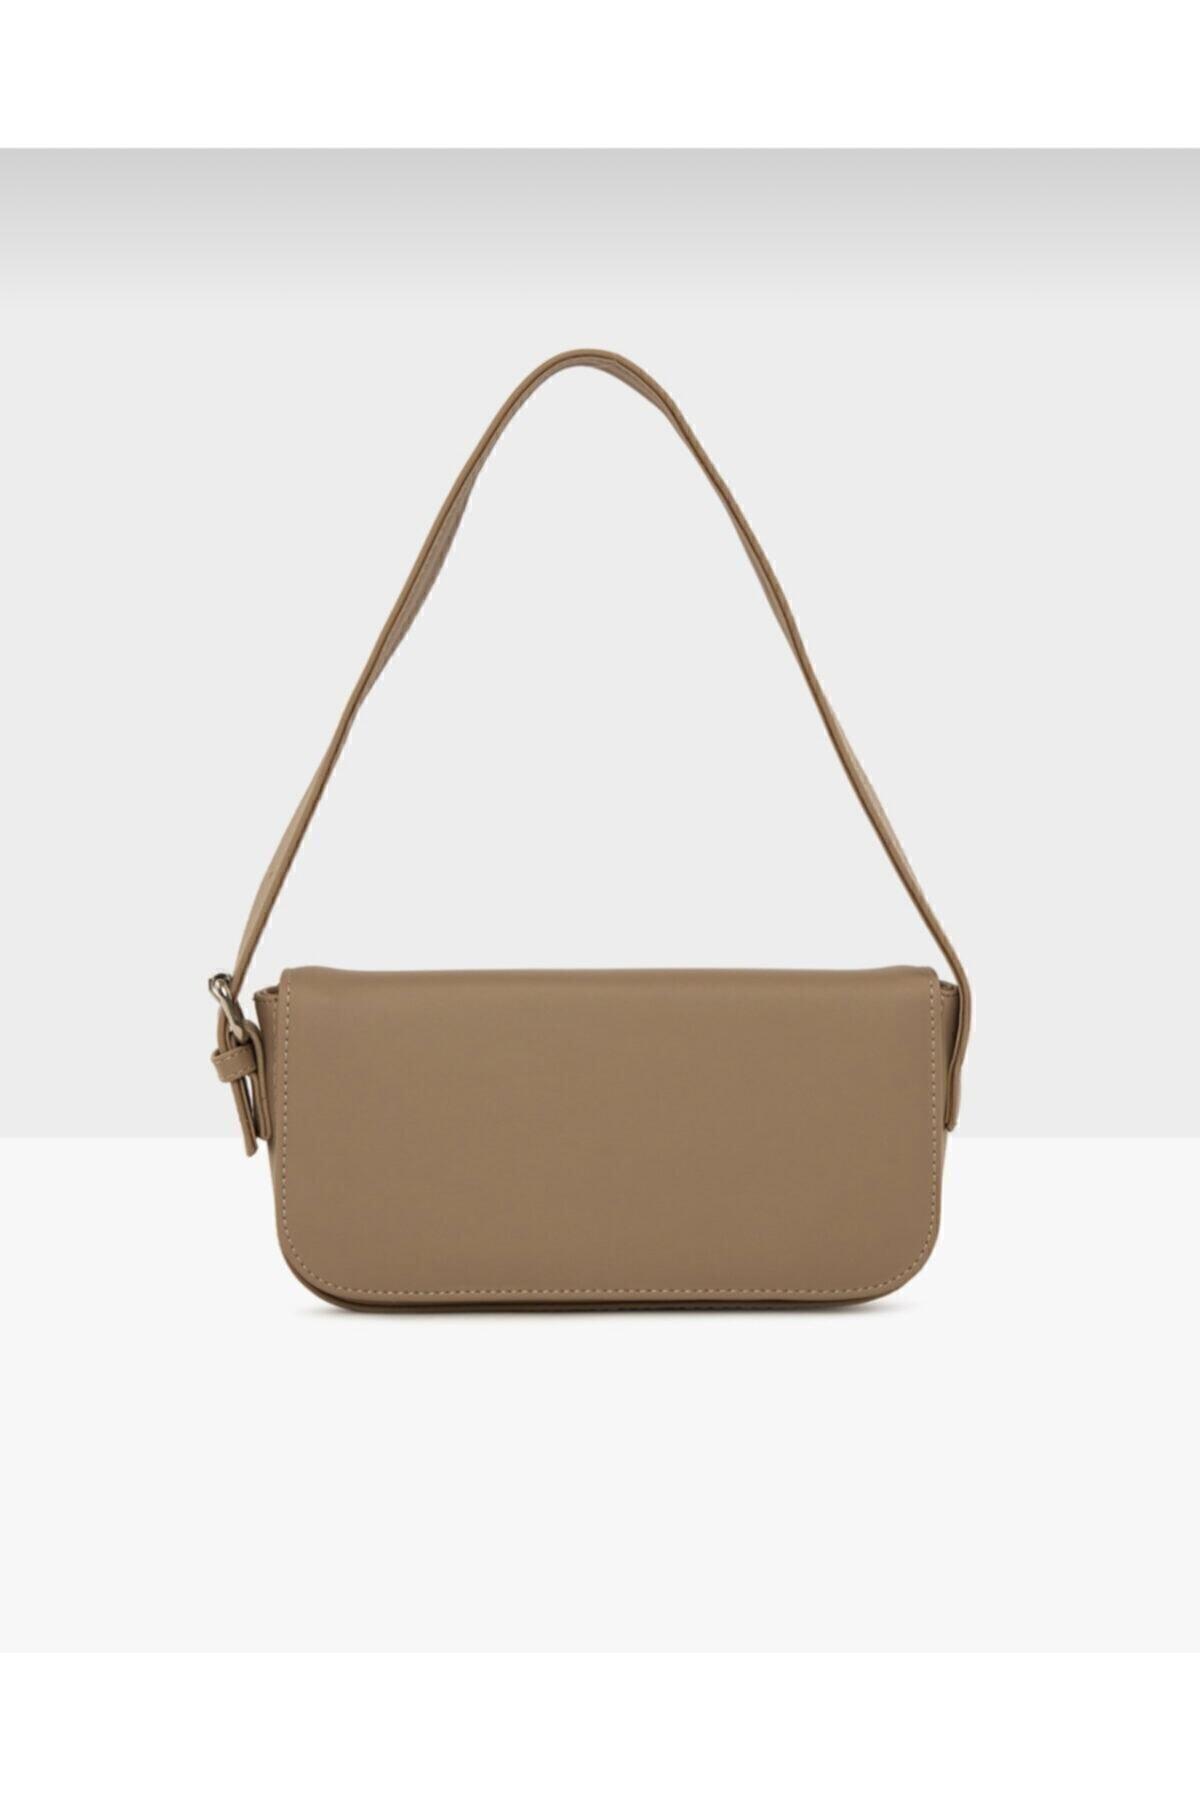 bag&more Kadın Vizon Kapaklı Baget Çanta 1